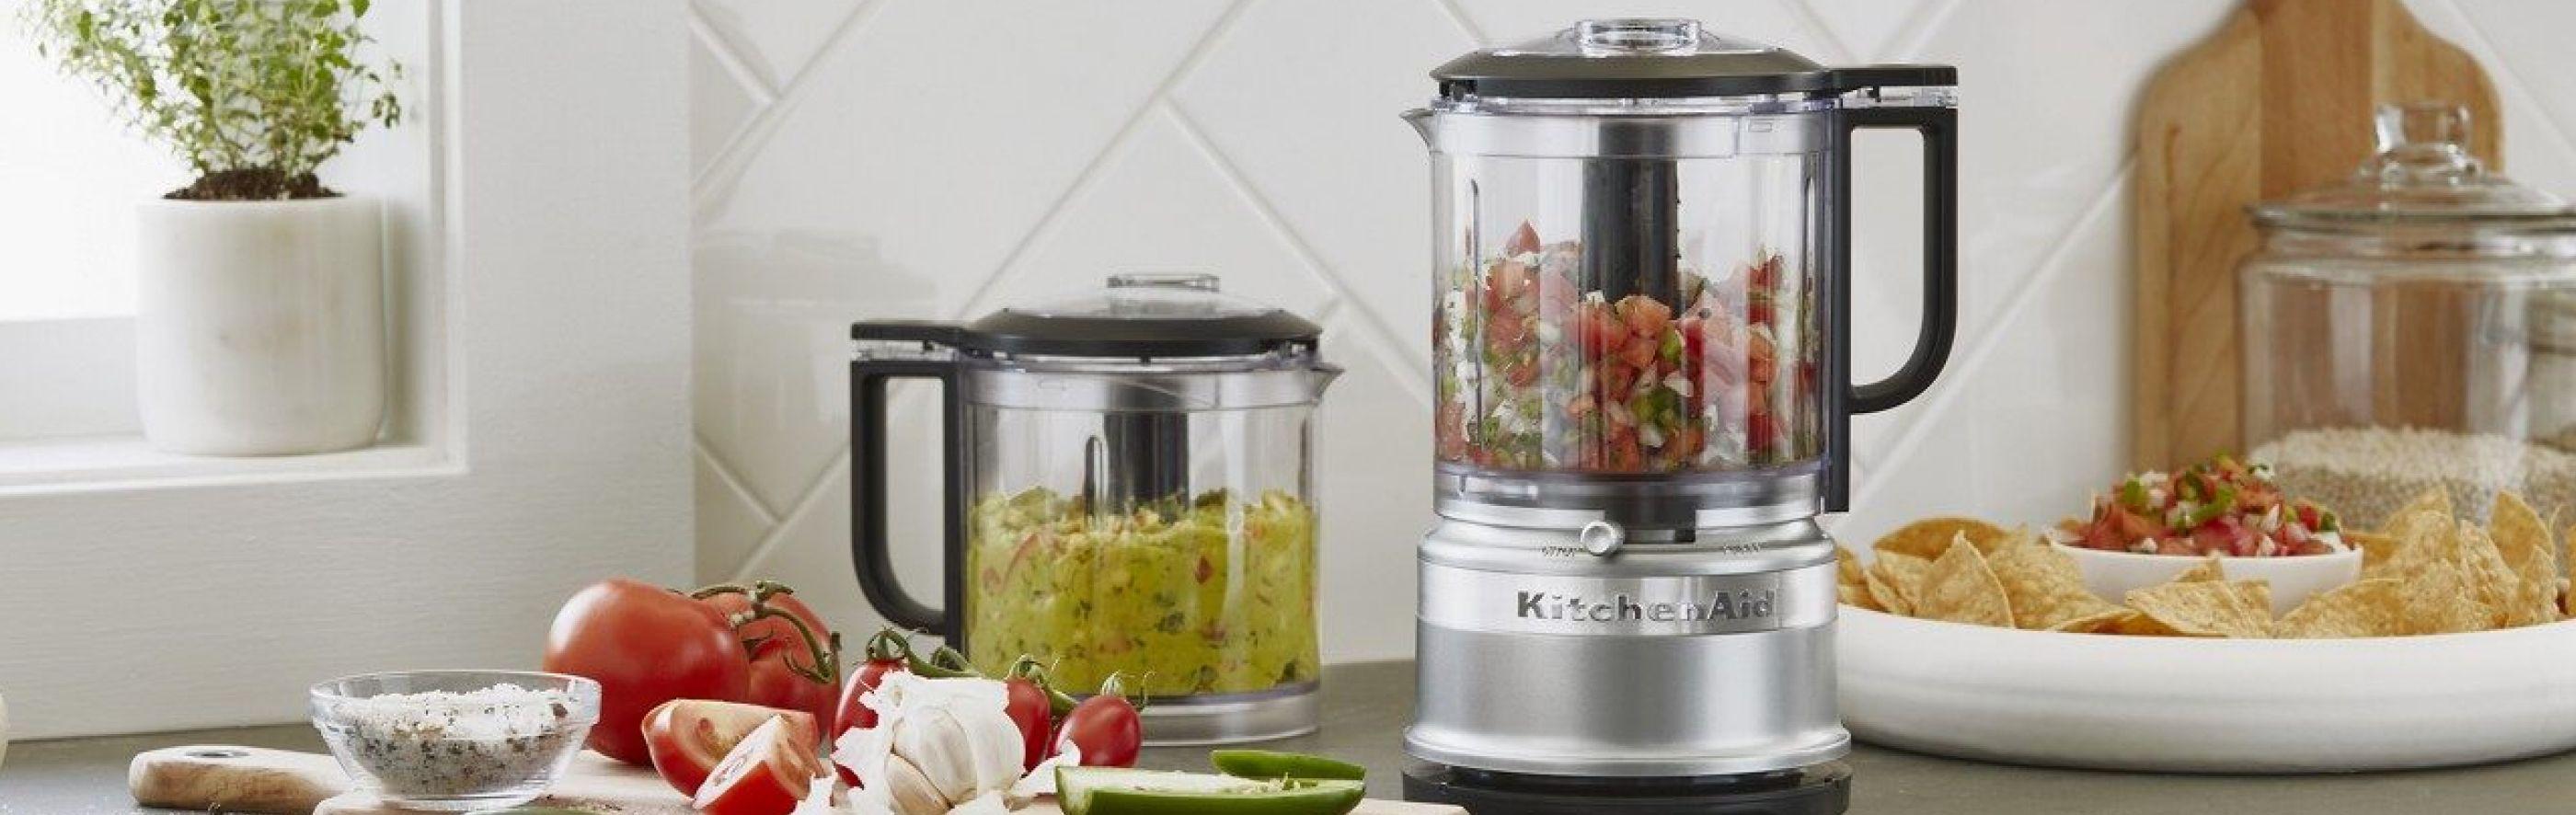 Silver KitchenAid® food processor on kitchen counter